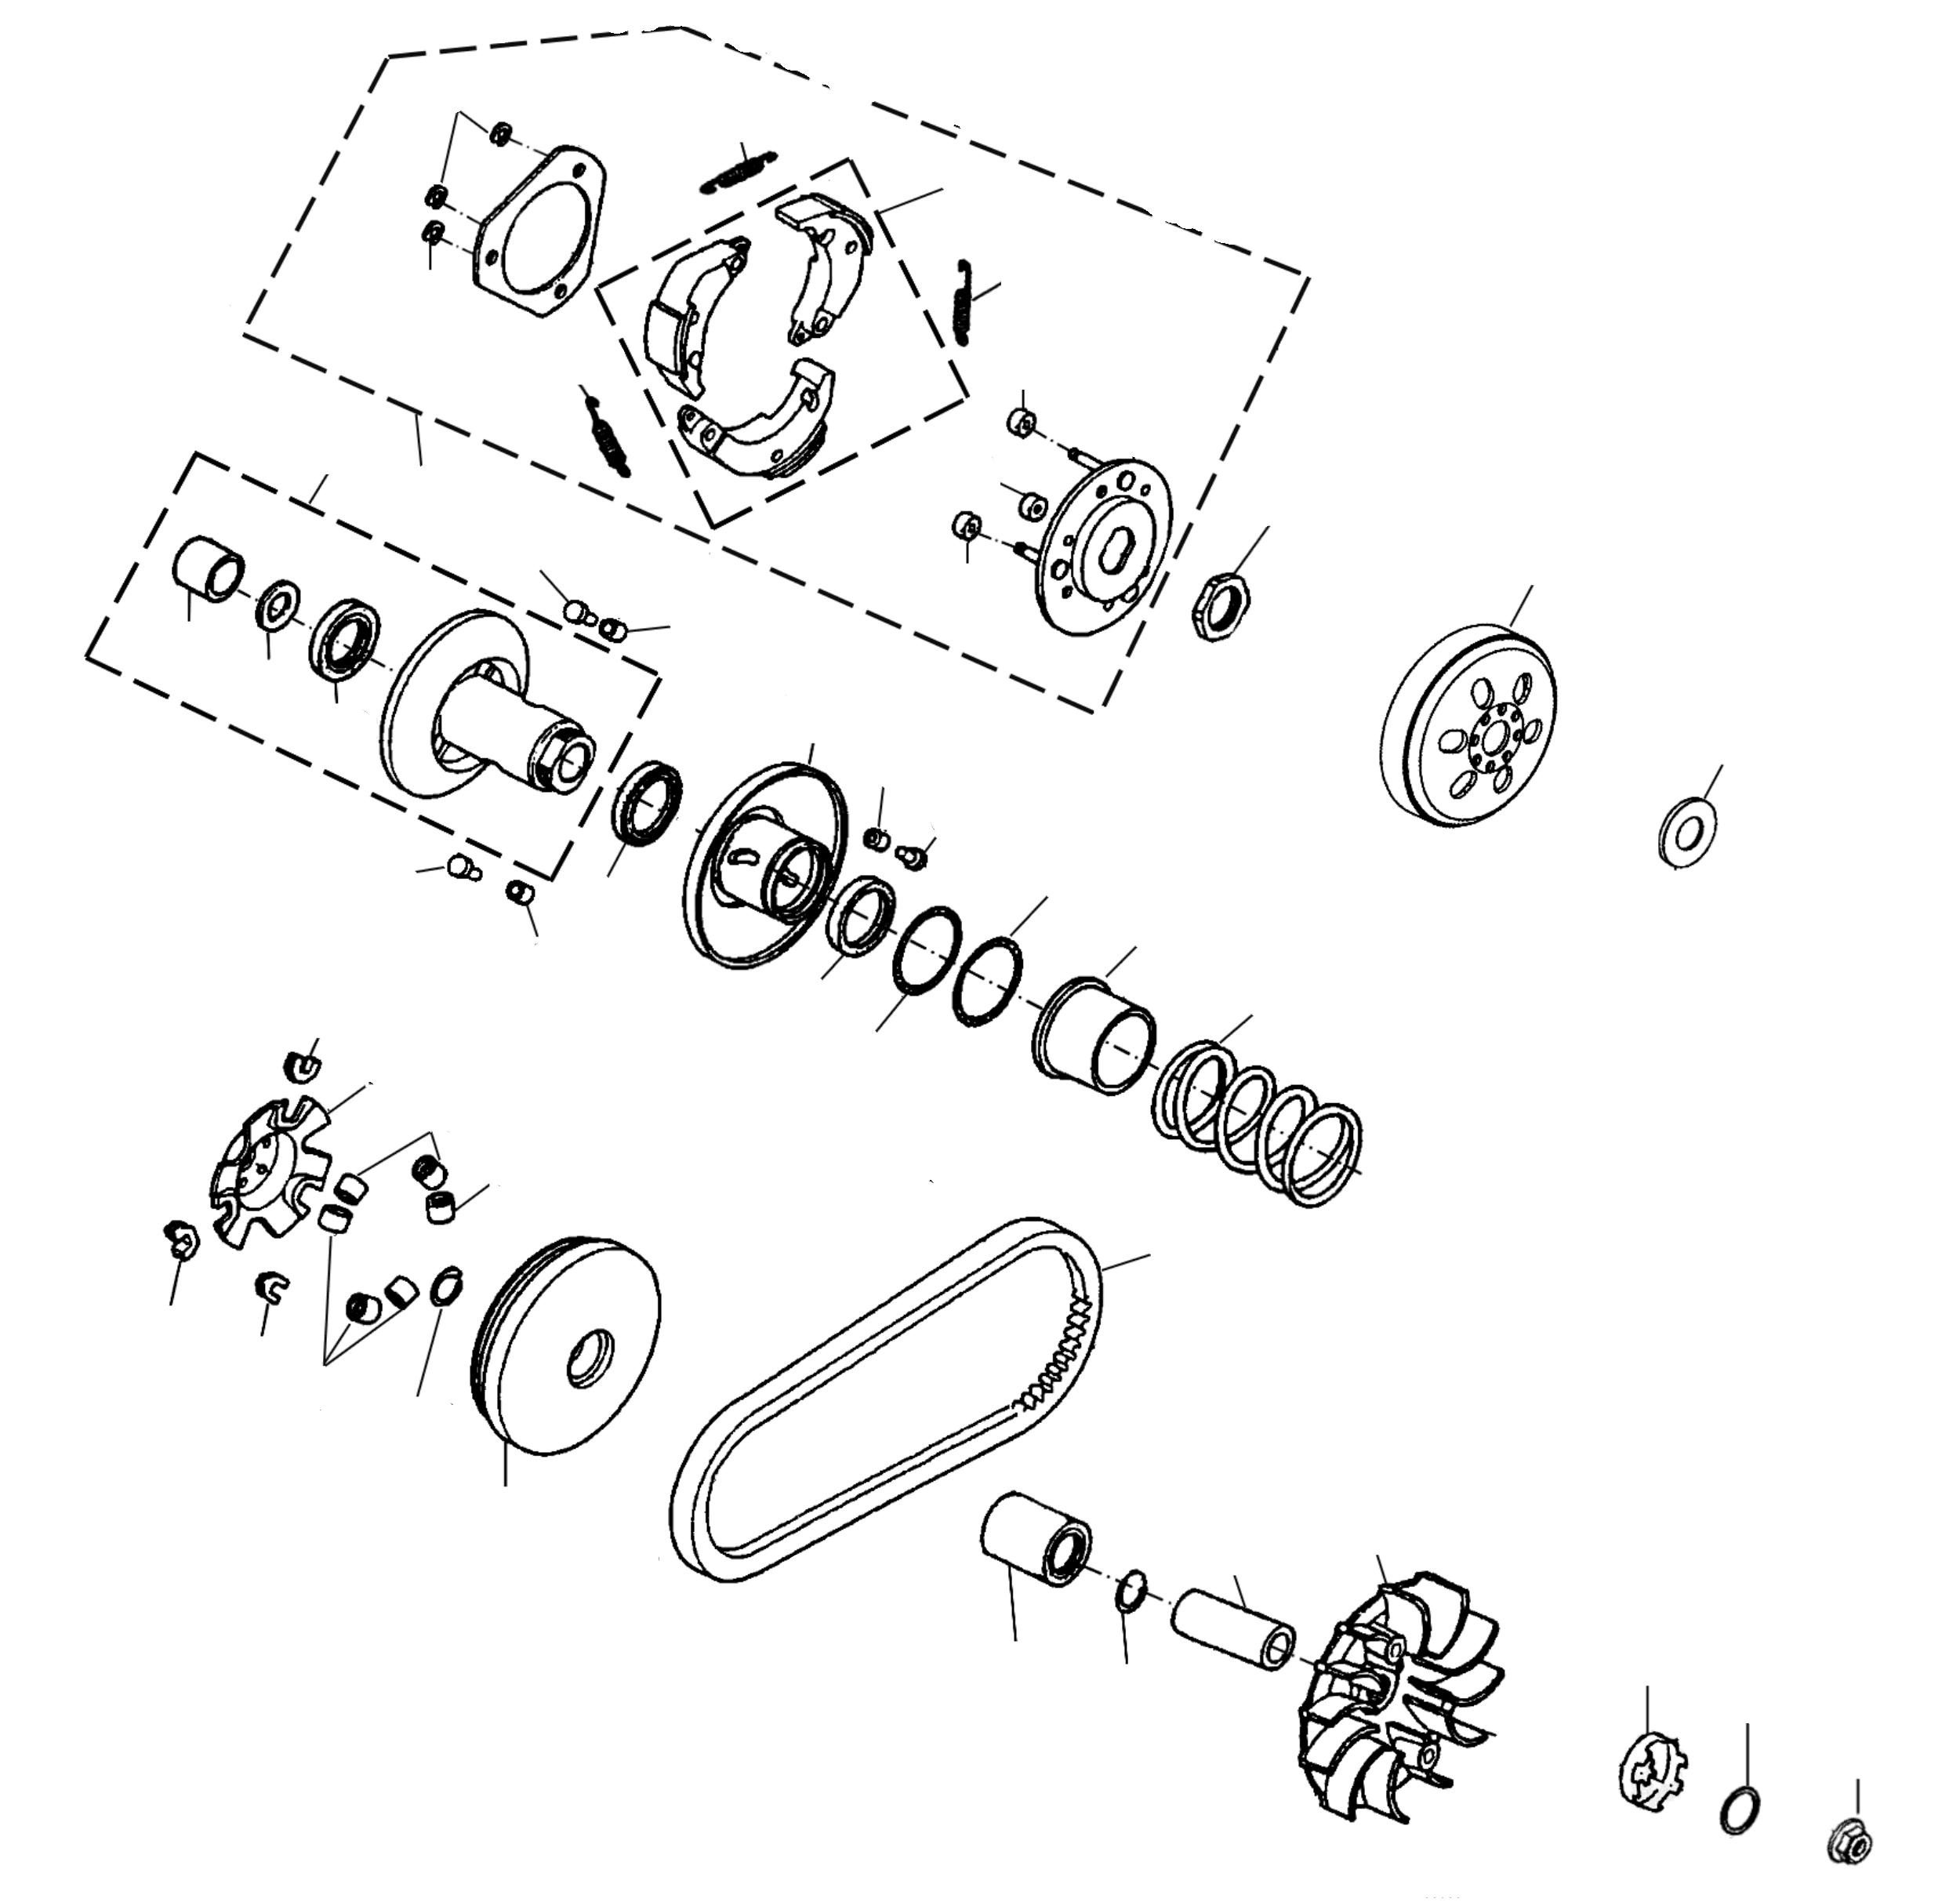 Variomatik, Kupplung, Keilriemen